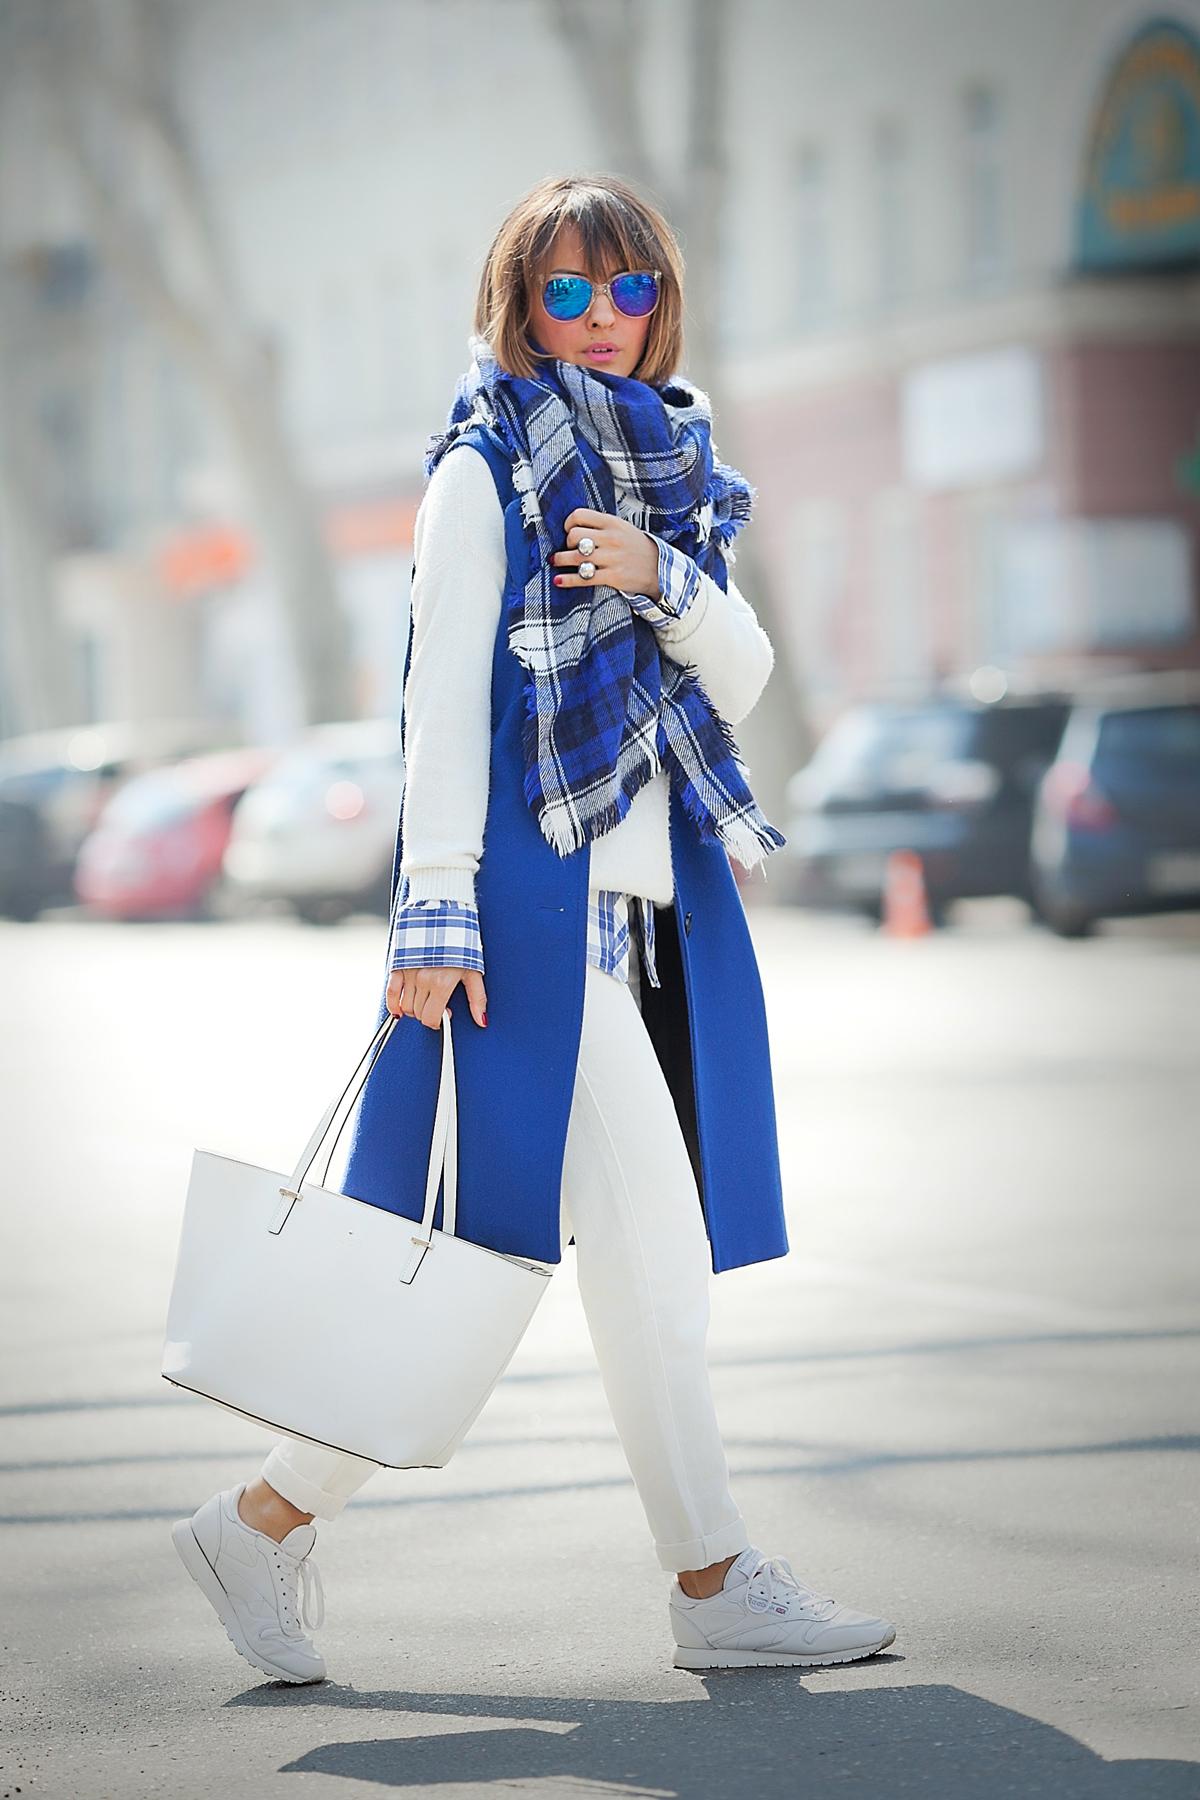 white kate spade new york tote bag on GalantGirl.com